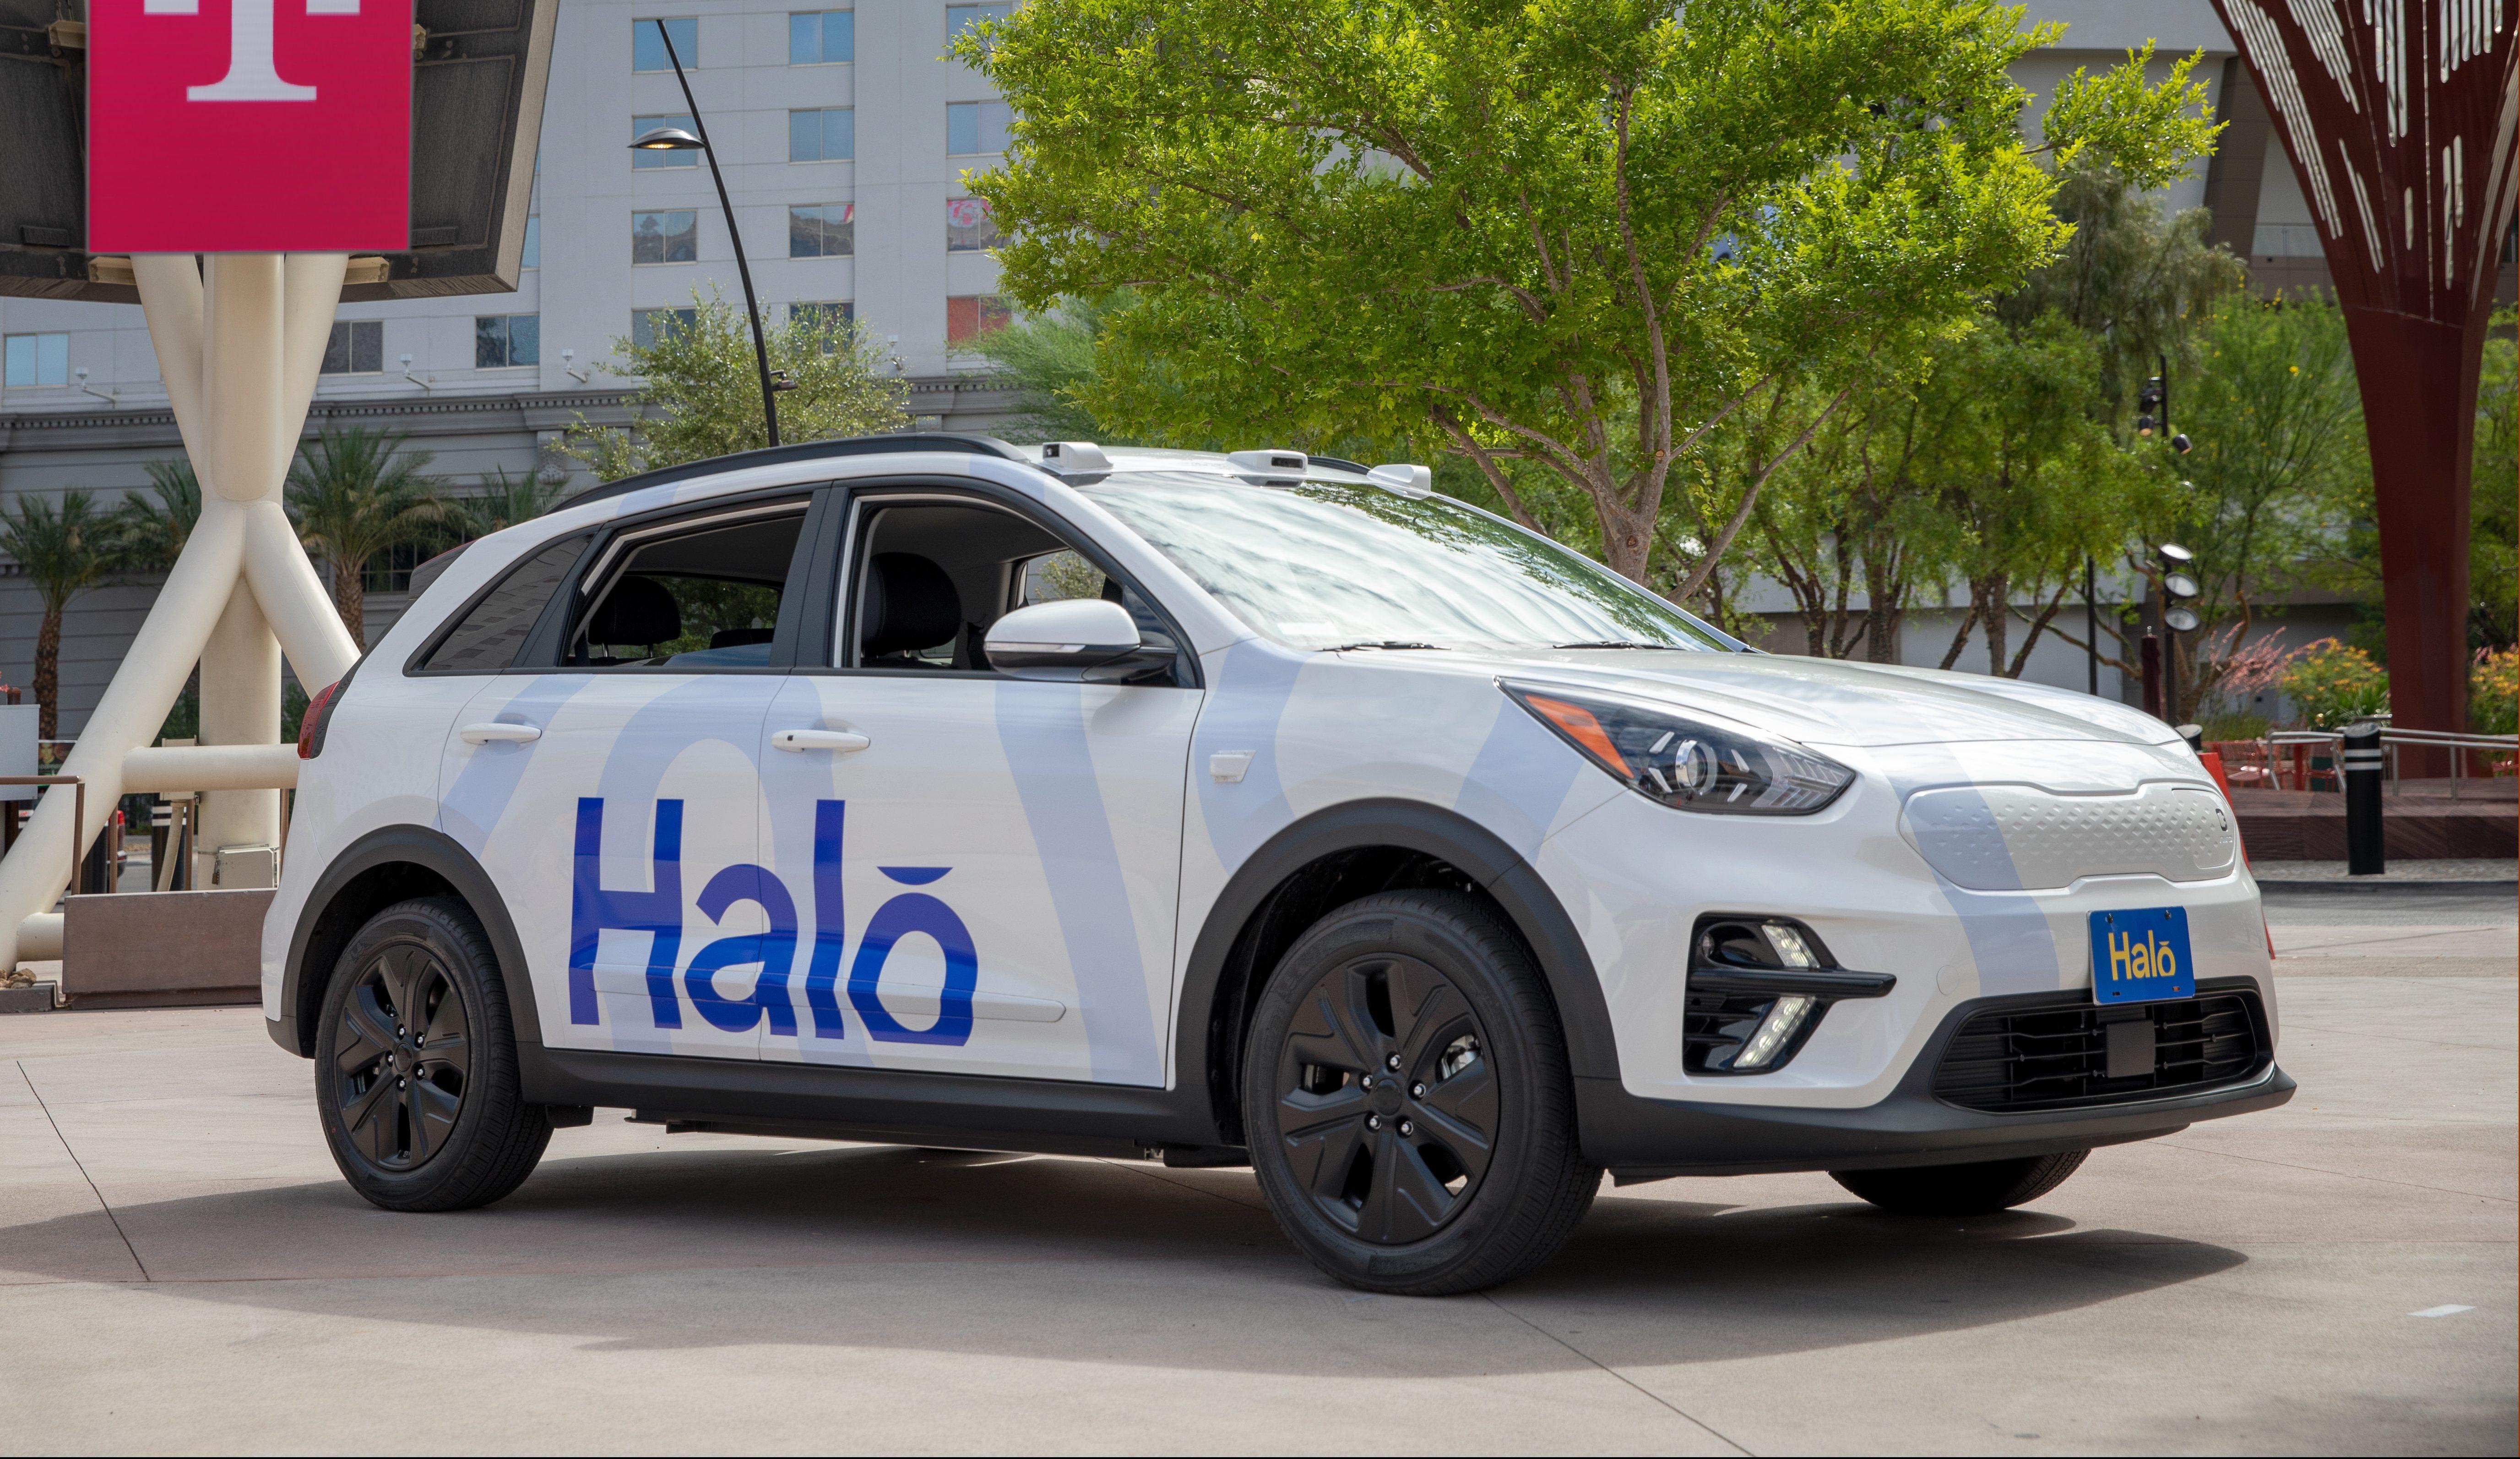 Halo Driverless Car